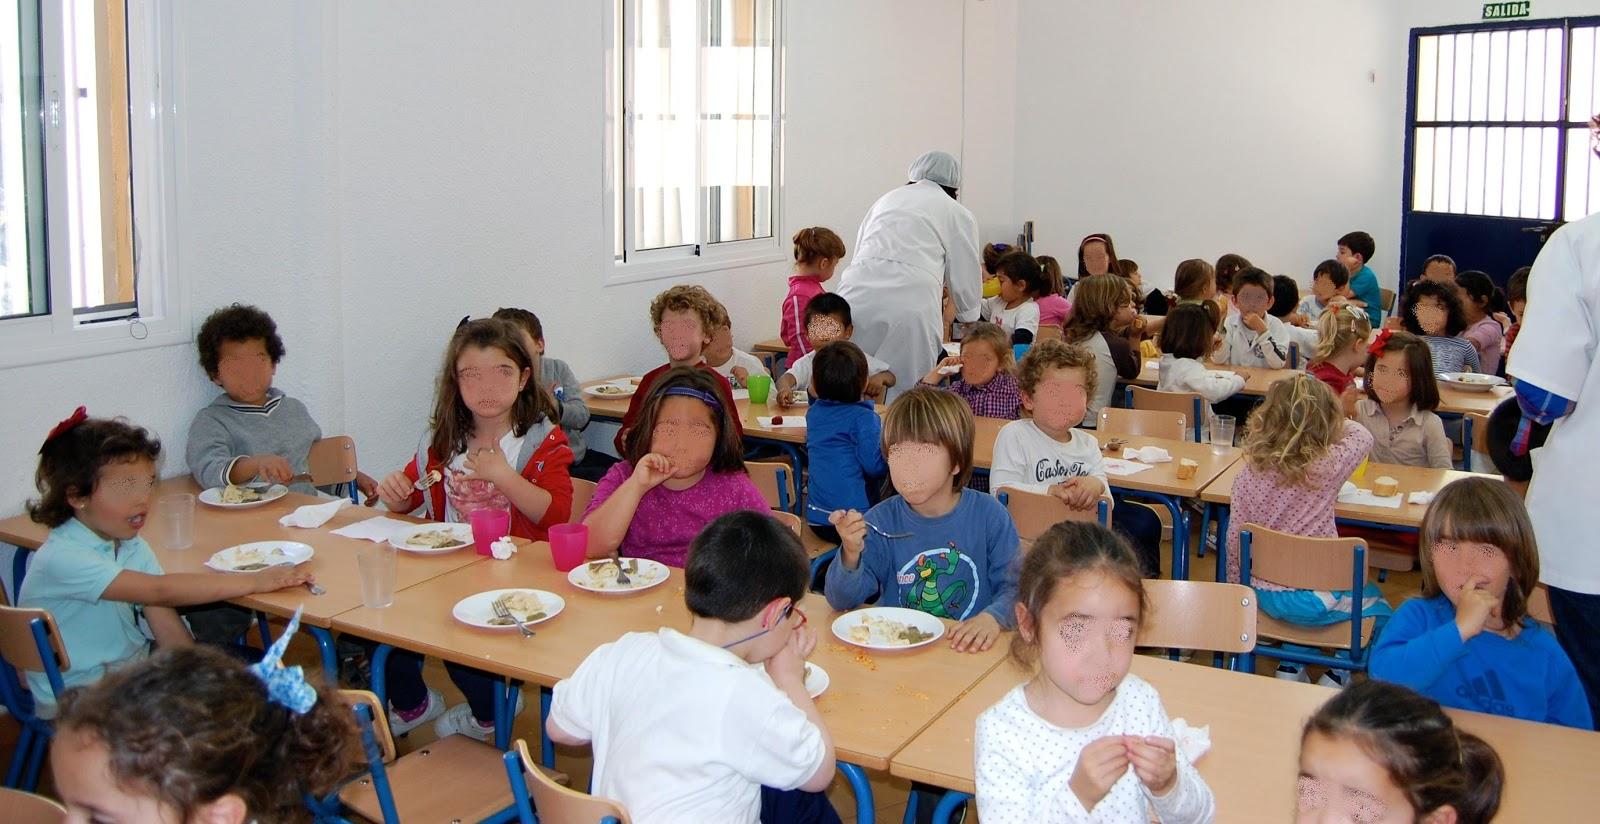 Escuela infantil mart n de gainza comedor for Comedor de escuela